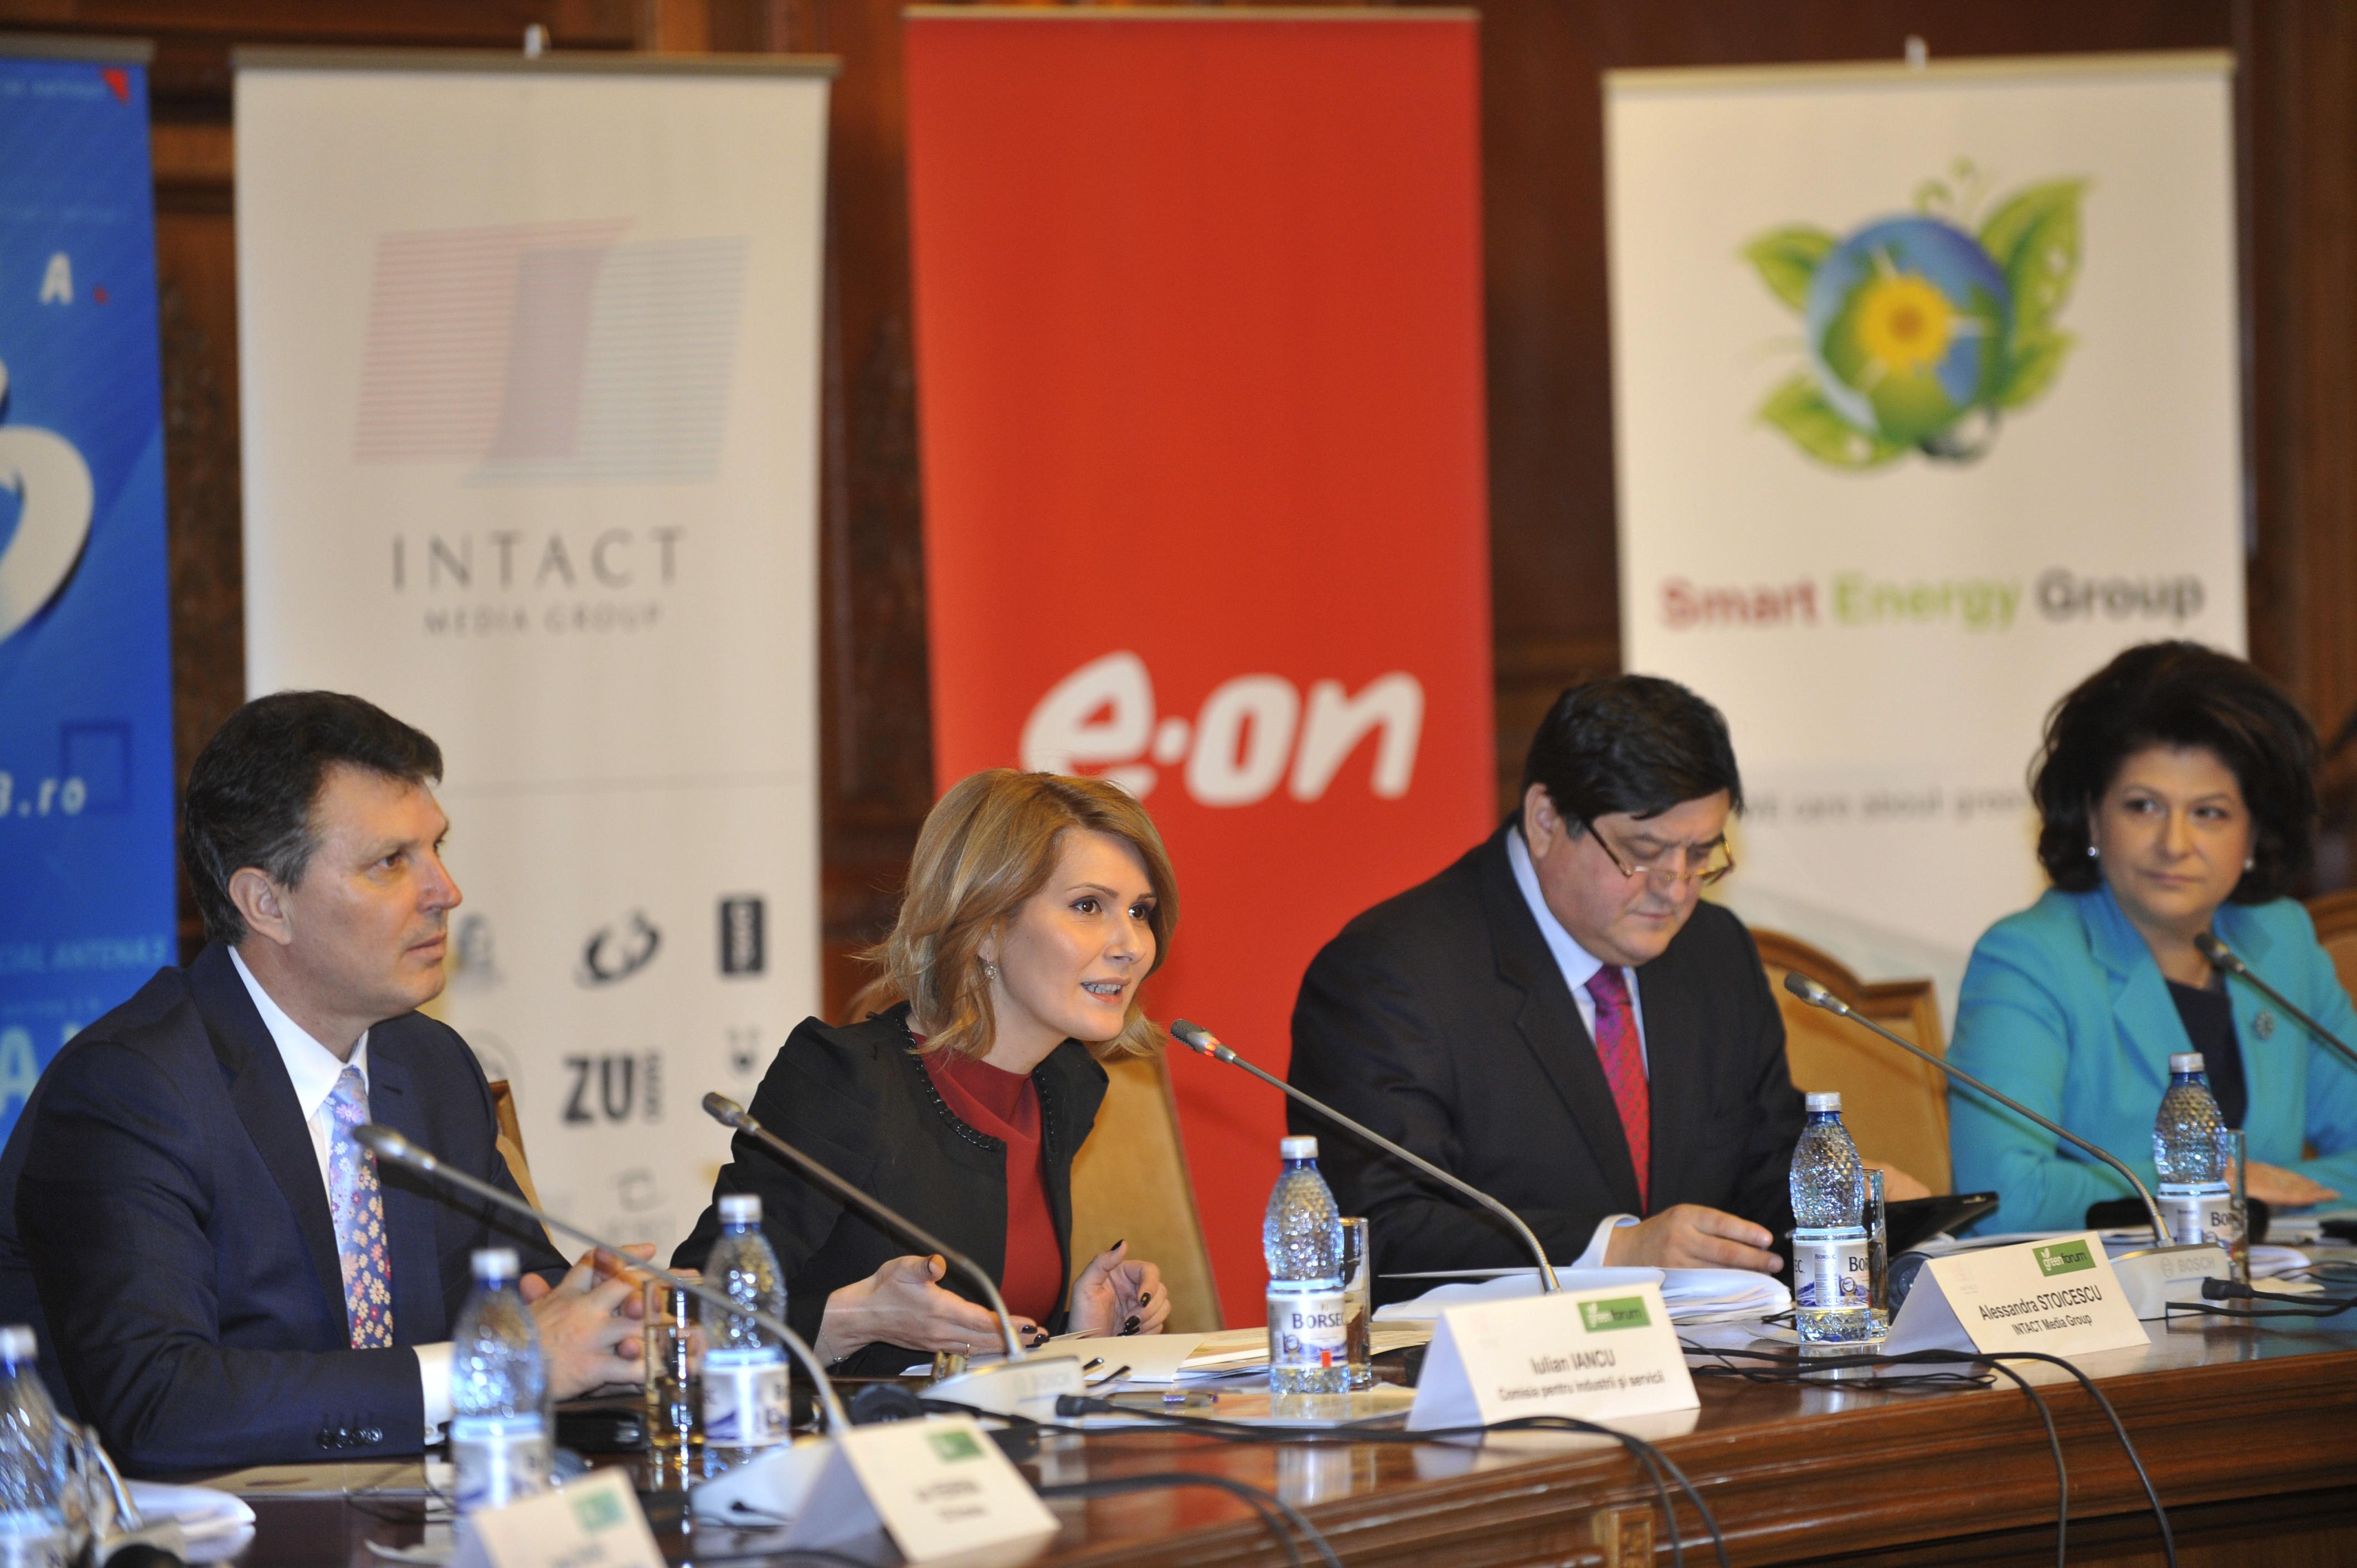 Iulian Iancu, Alessandra Stoicescu, Constantin Nita, Rovana Plumb